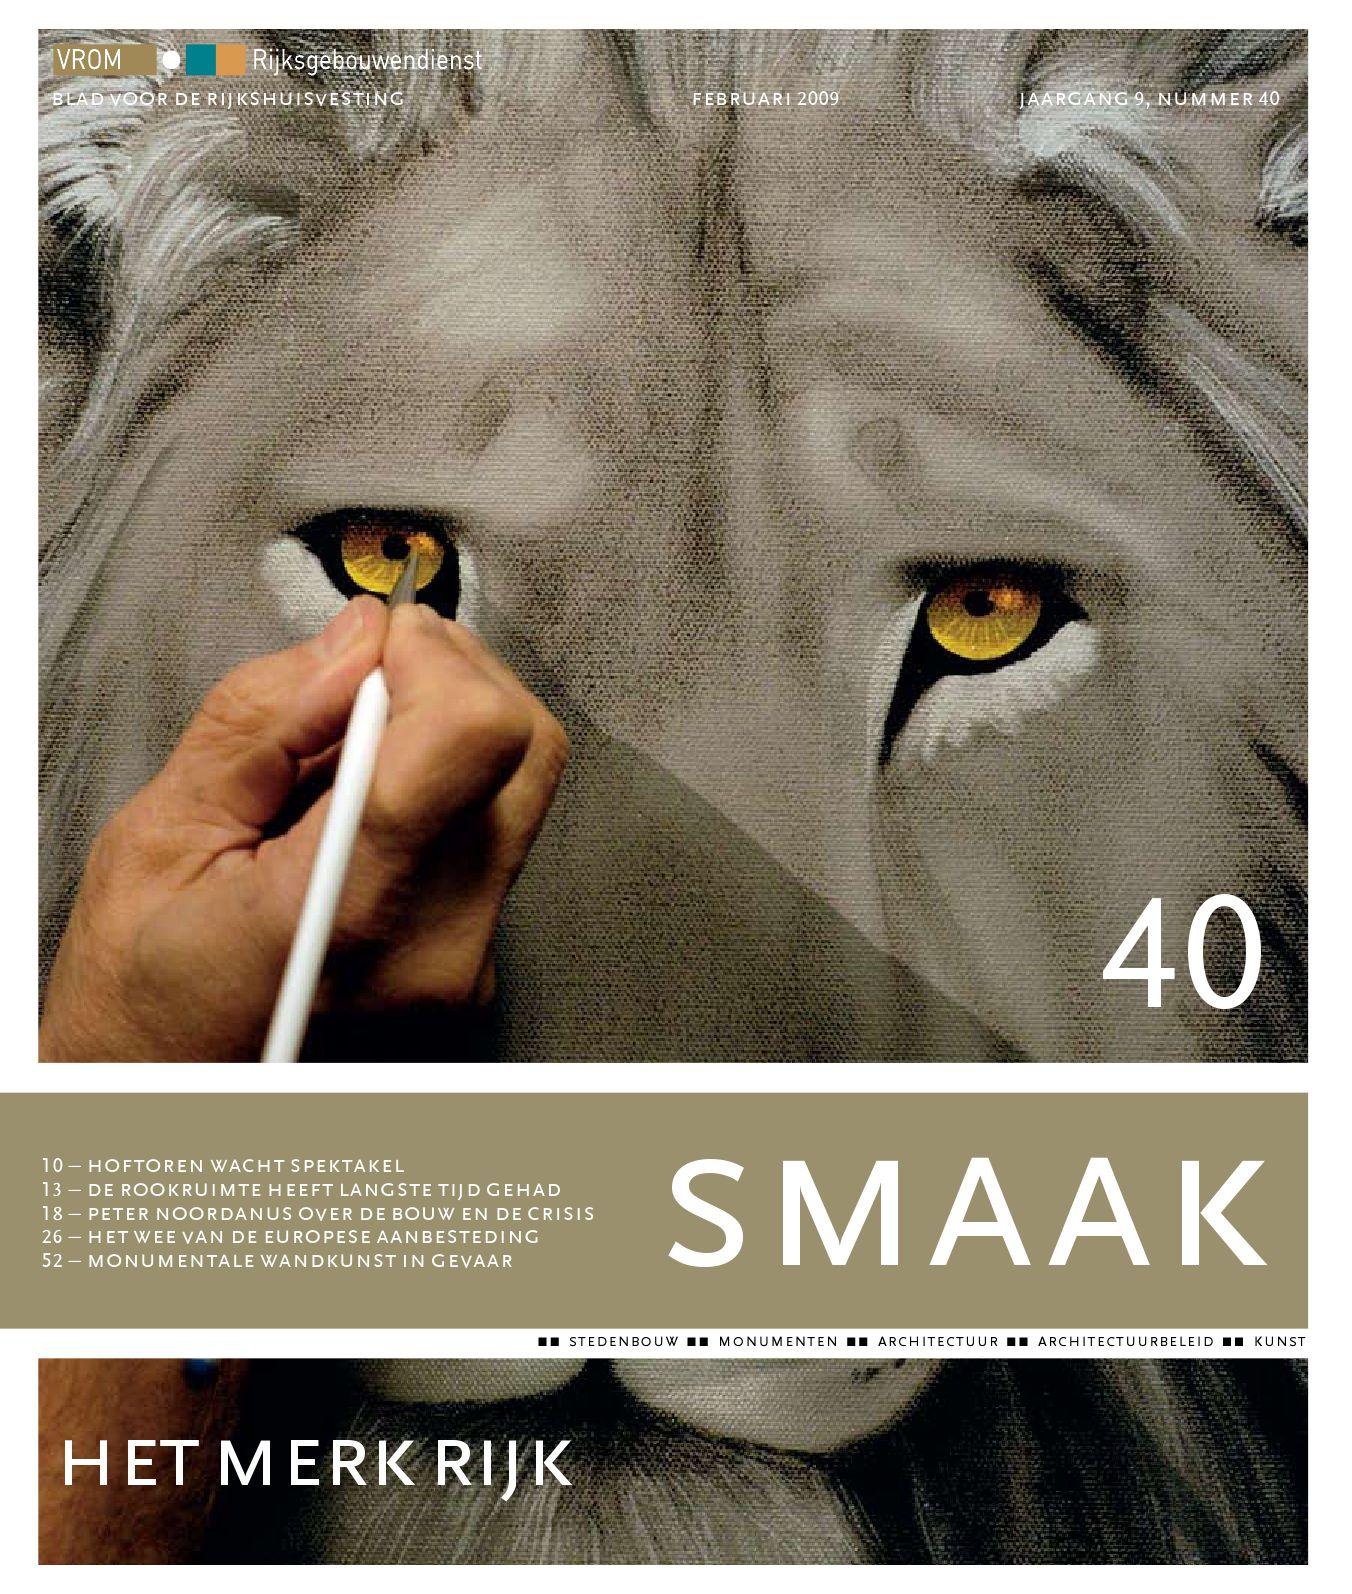 Smaak 40 by rijksvastgoedbedrijf   issuu